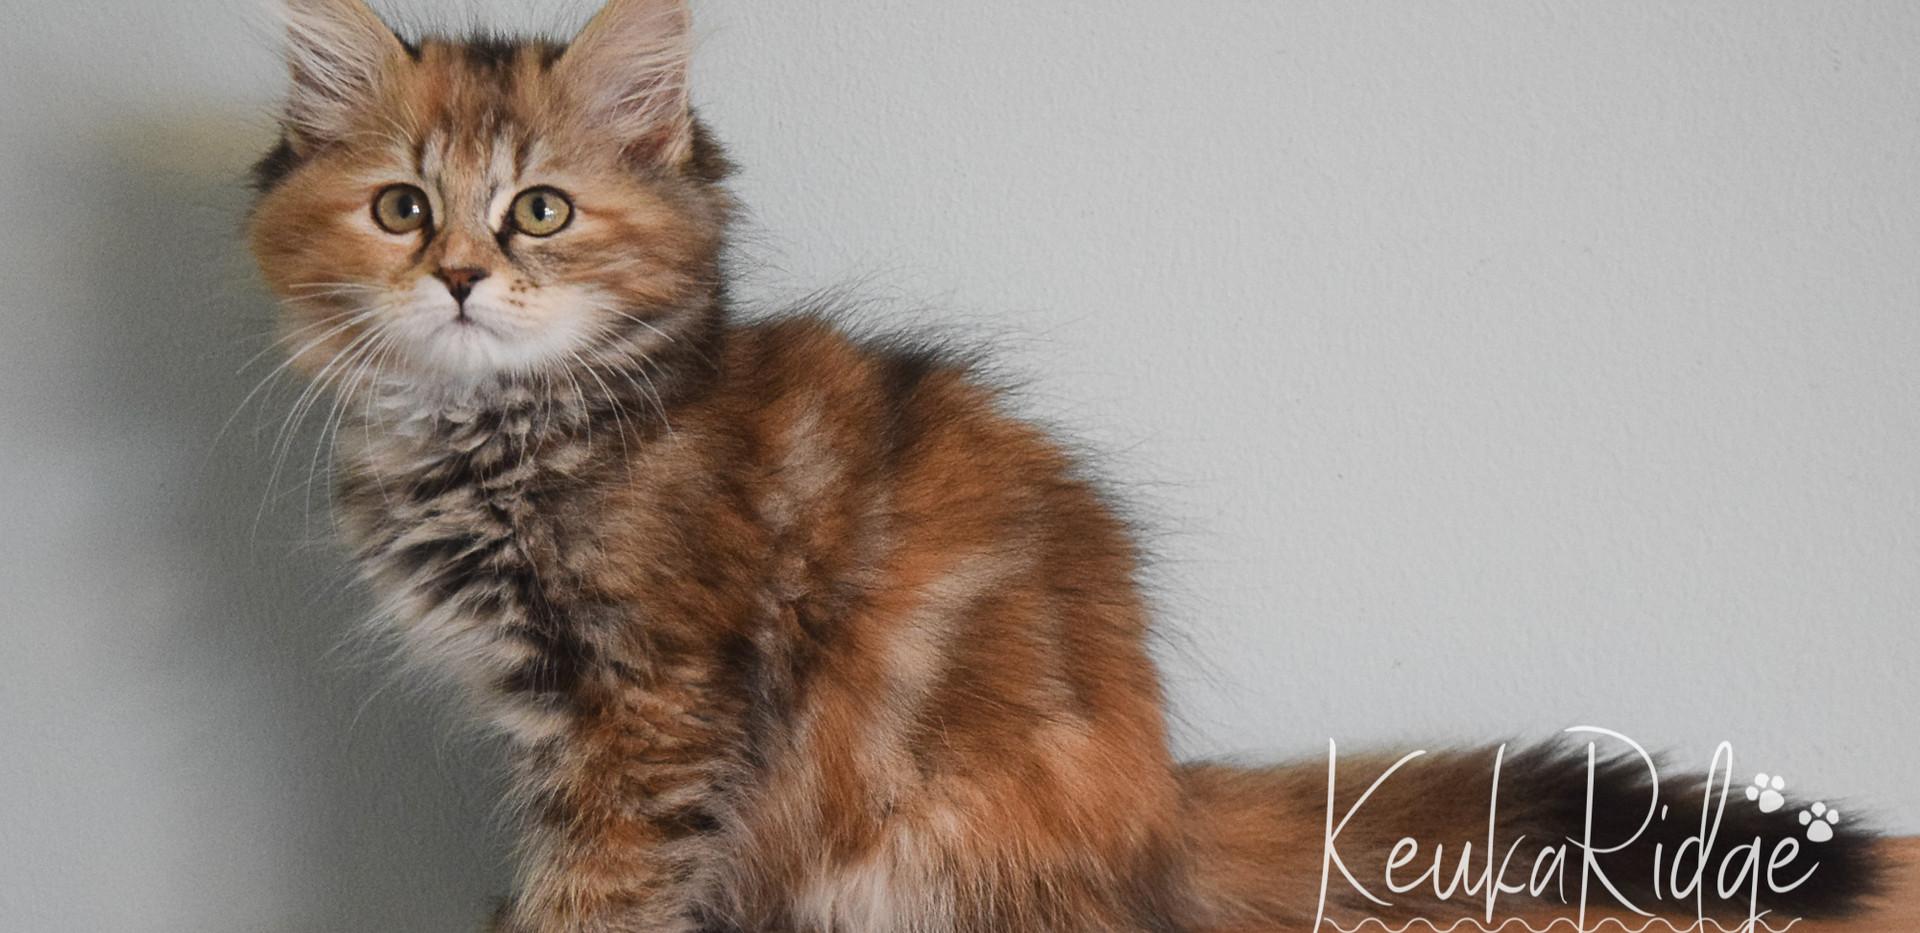 Keuka Ridge Fallon - 11.5 Weeks Old